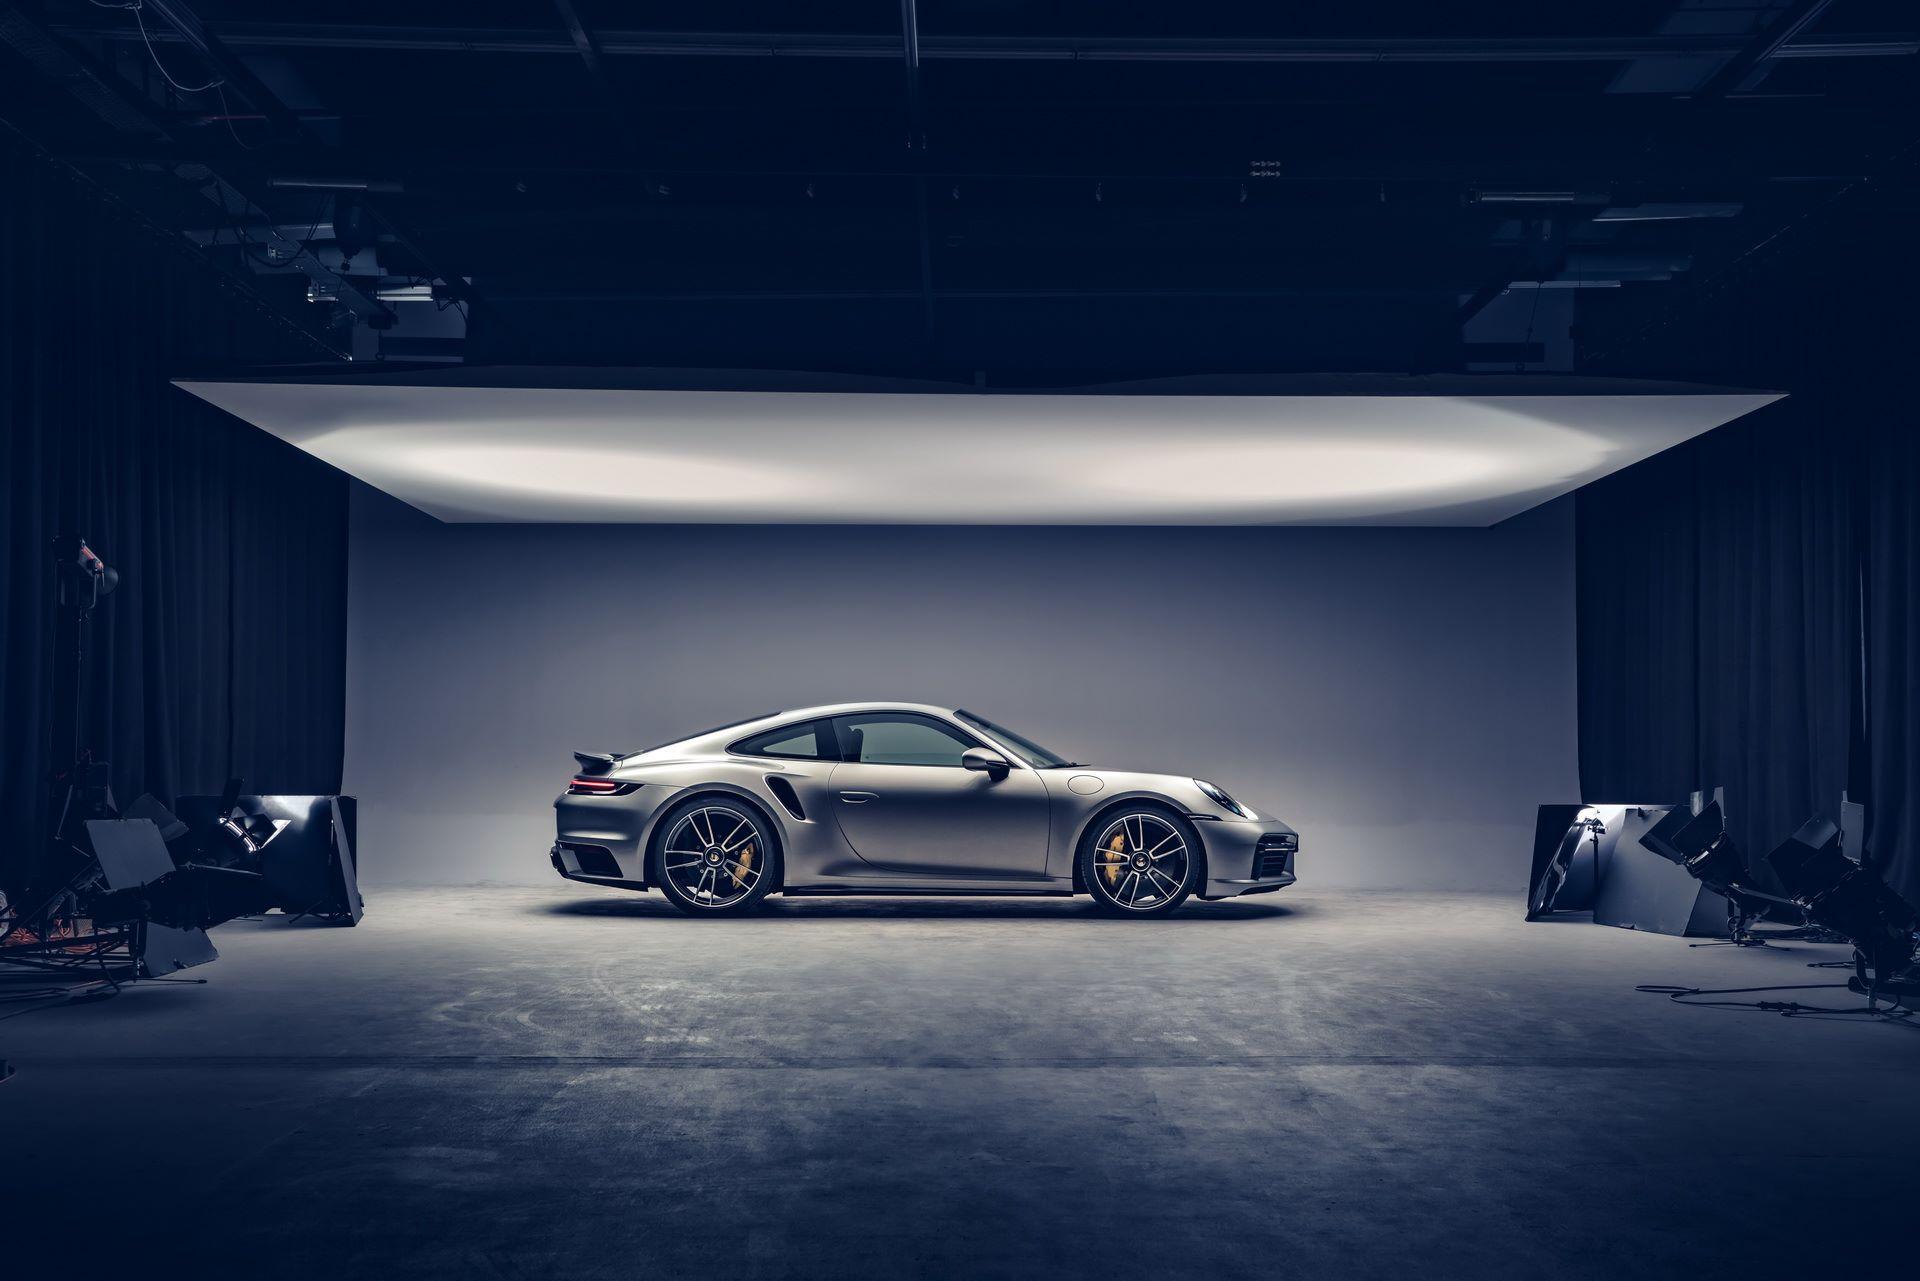 Porsche-911-Turbo-S-2020-7